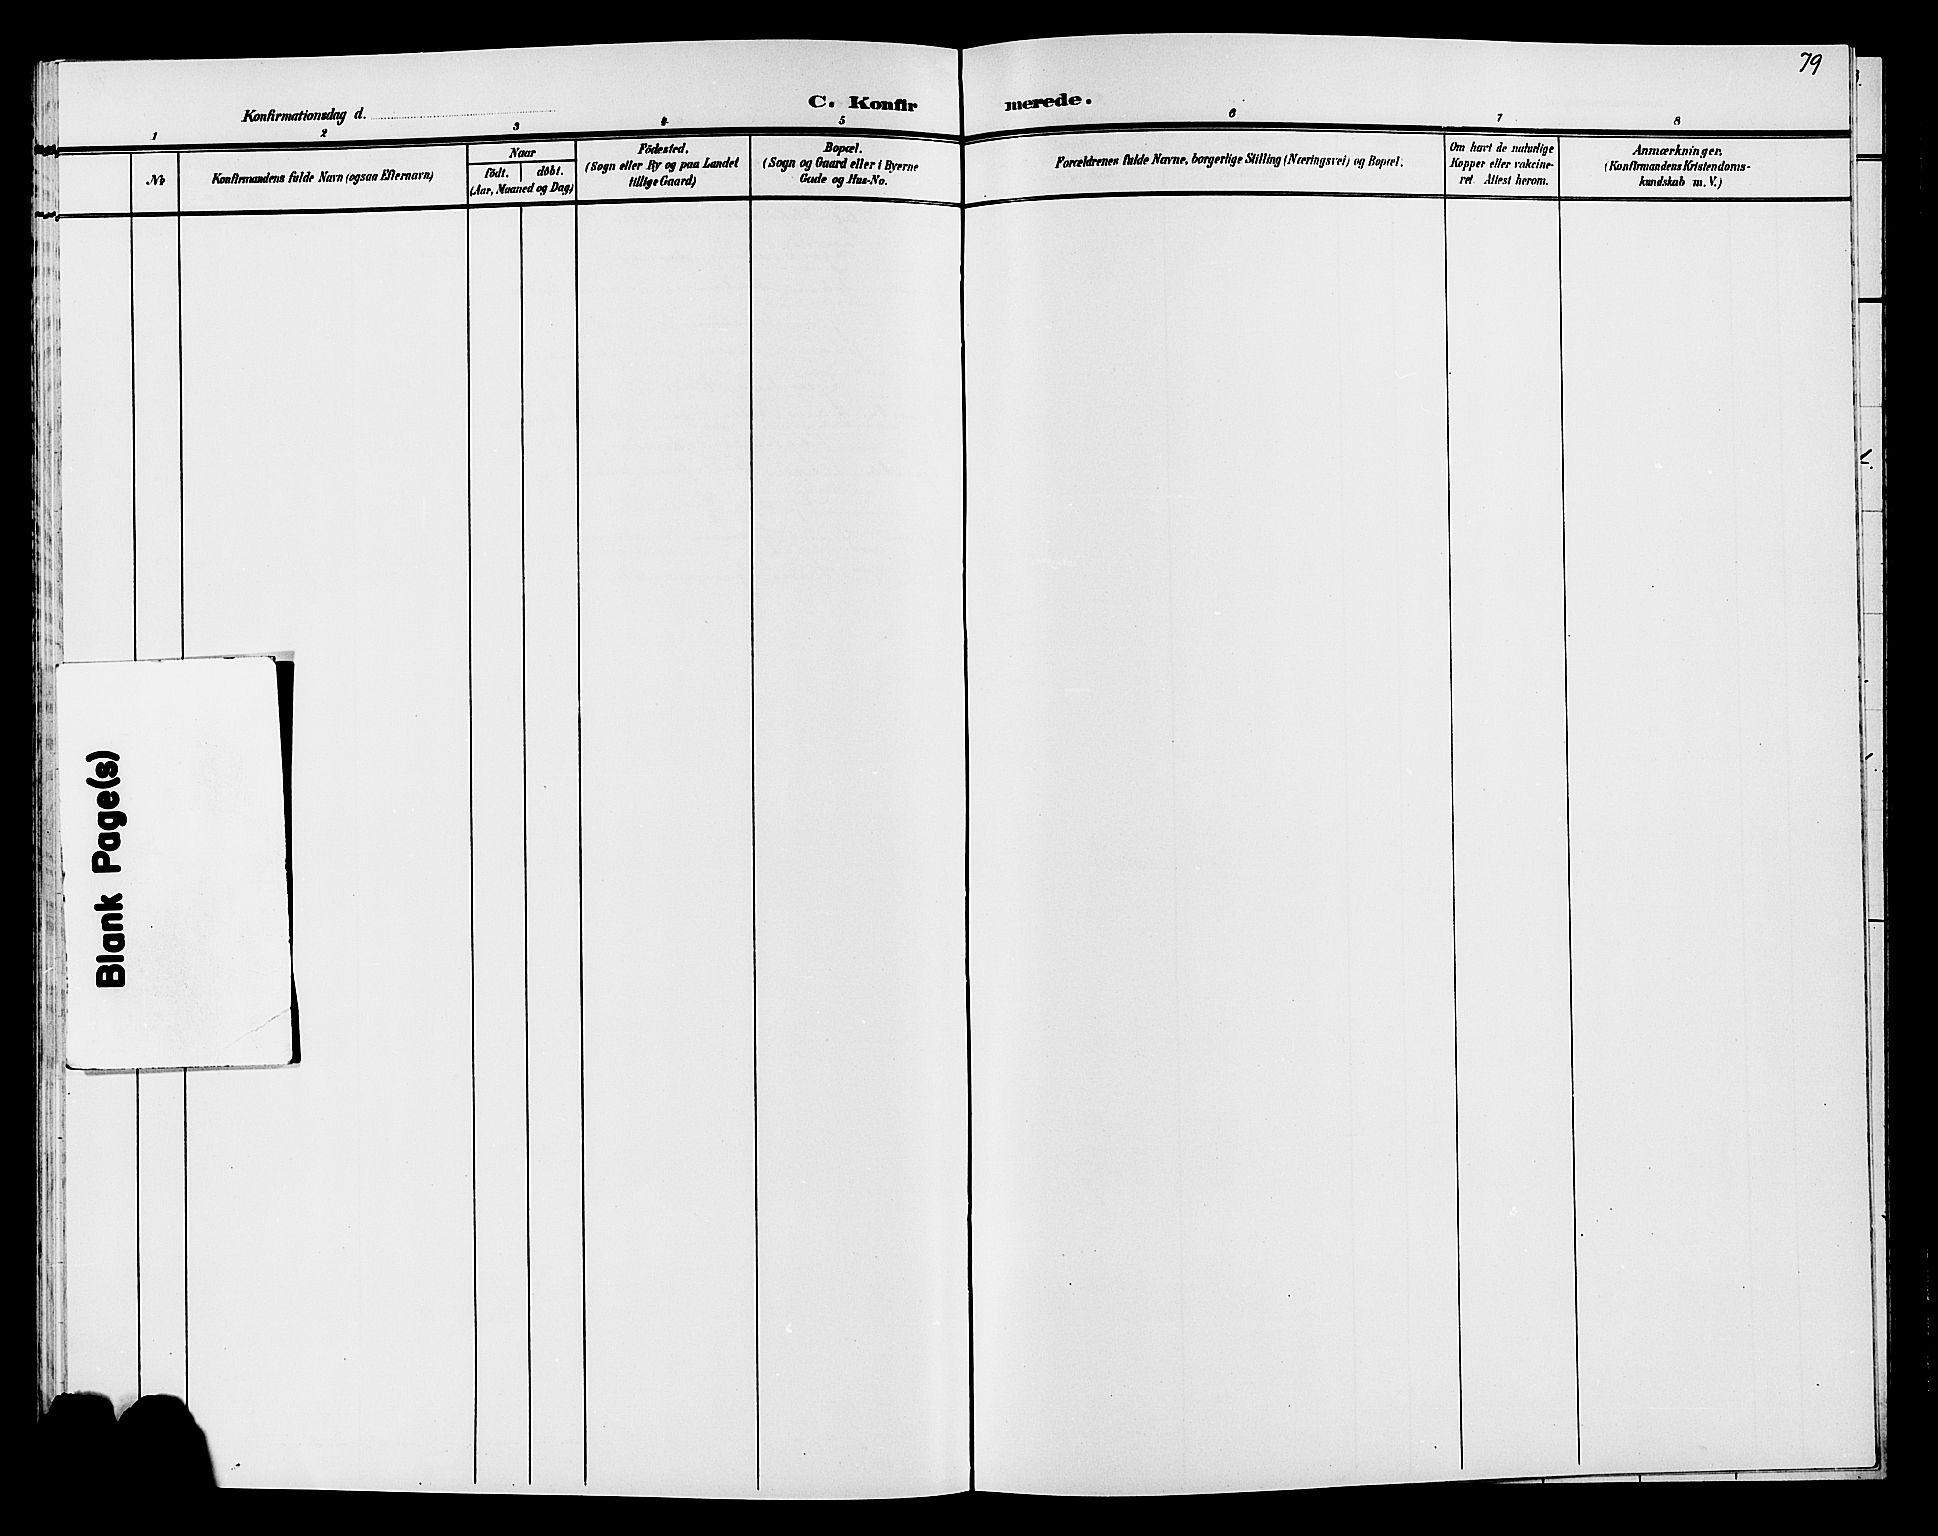 SAH, Søndre Land prestekontor, L/L0005: Klokkerbok nr. 5, 1902-1911, s. 79